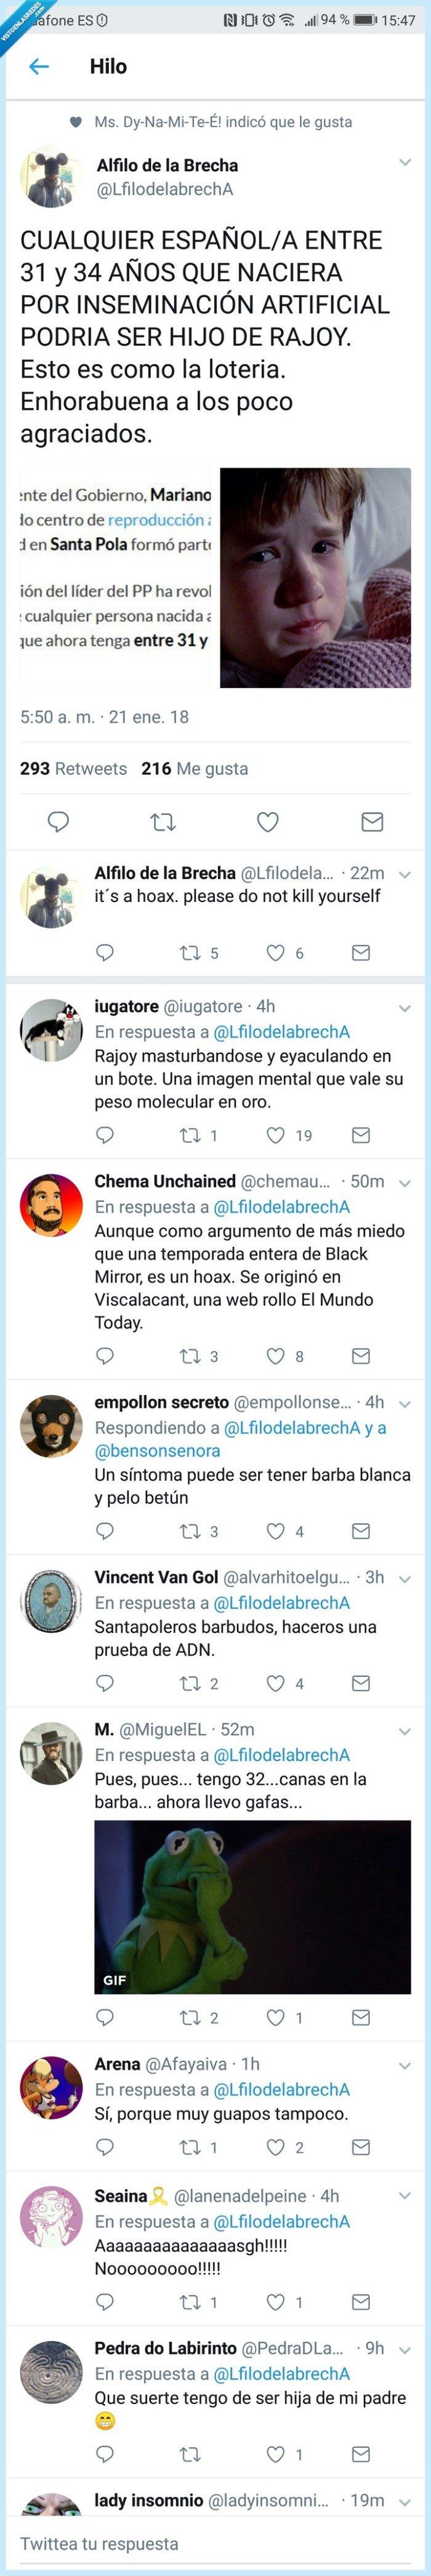 Rajoy,Twitter